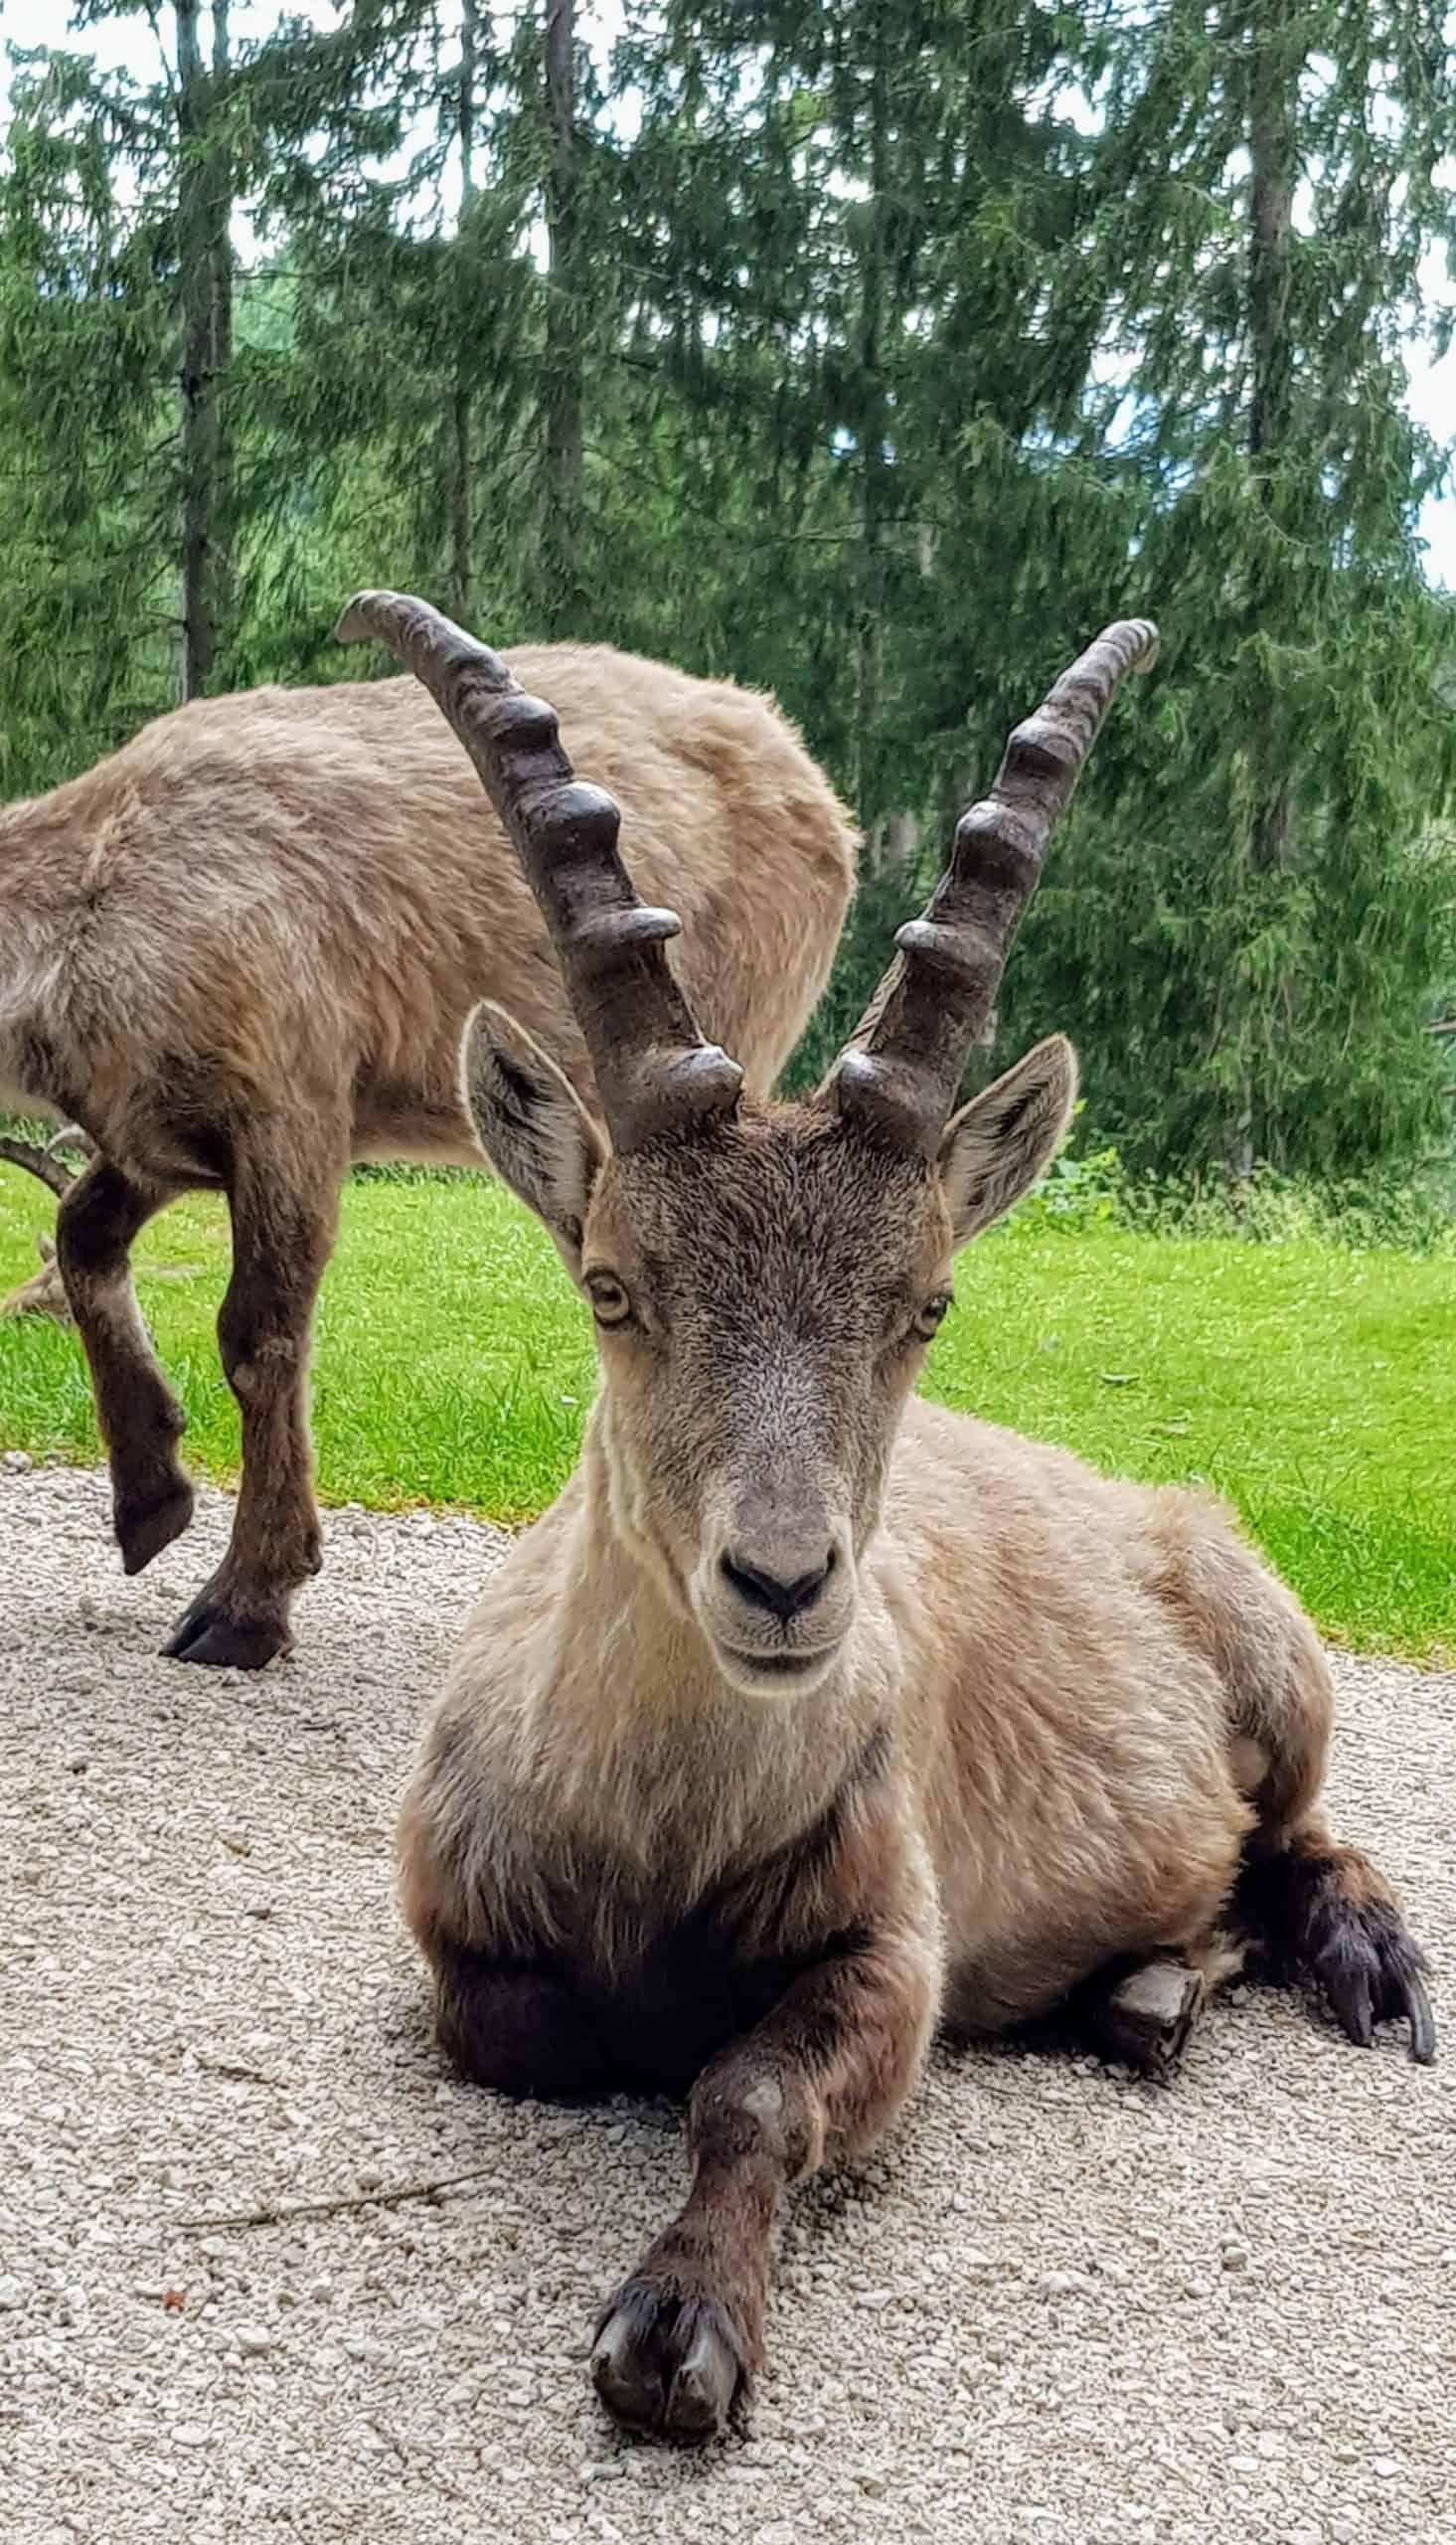 Steinbock im Tierpark Rosegg - geöffnetes Kärntner Ausflugsziel ab März